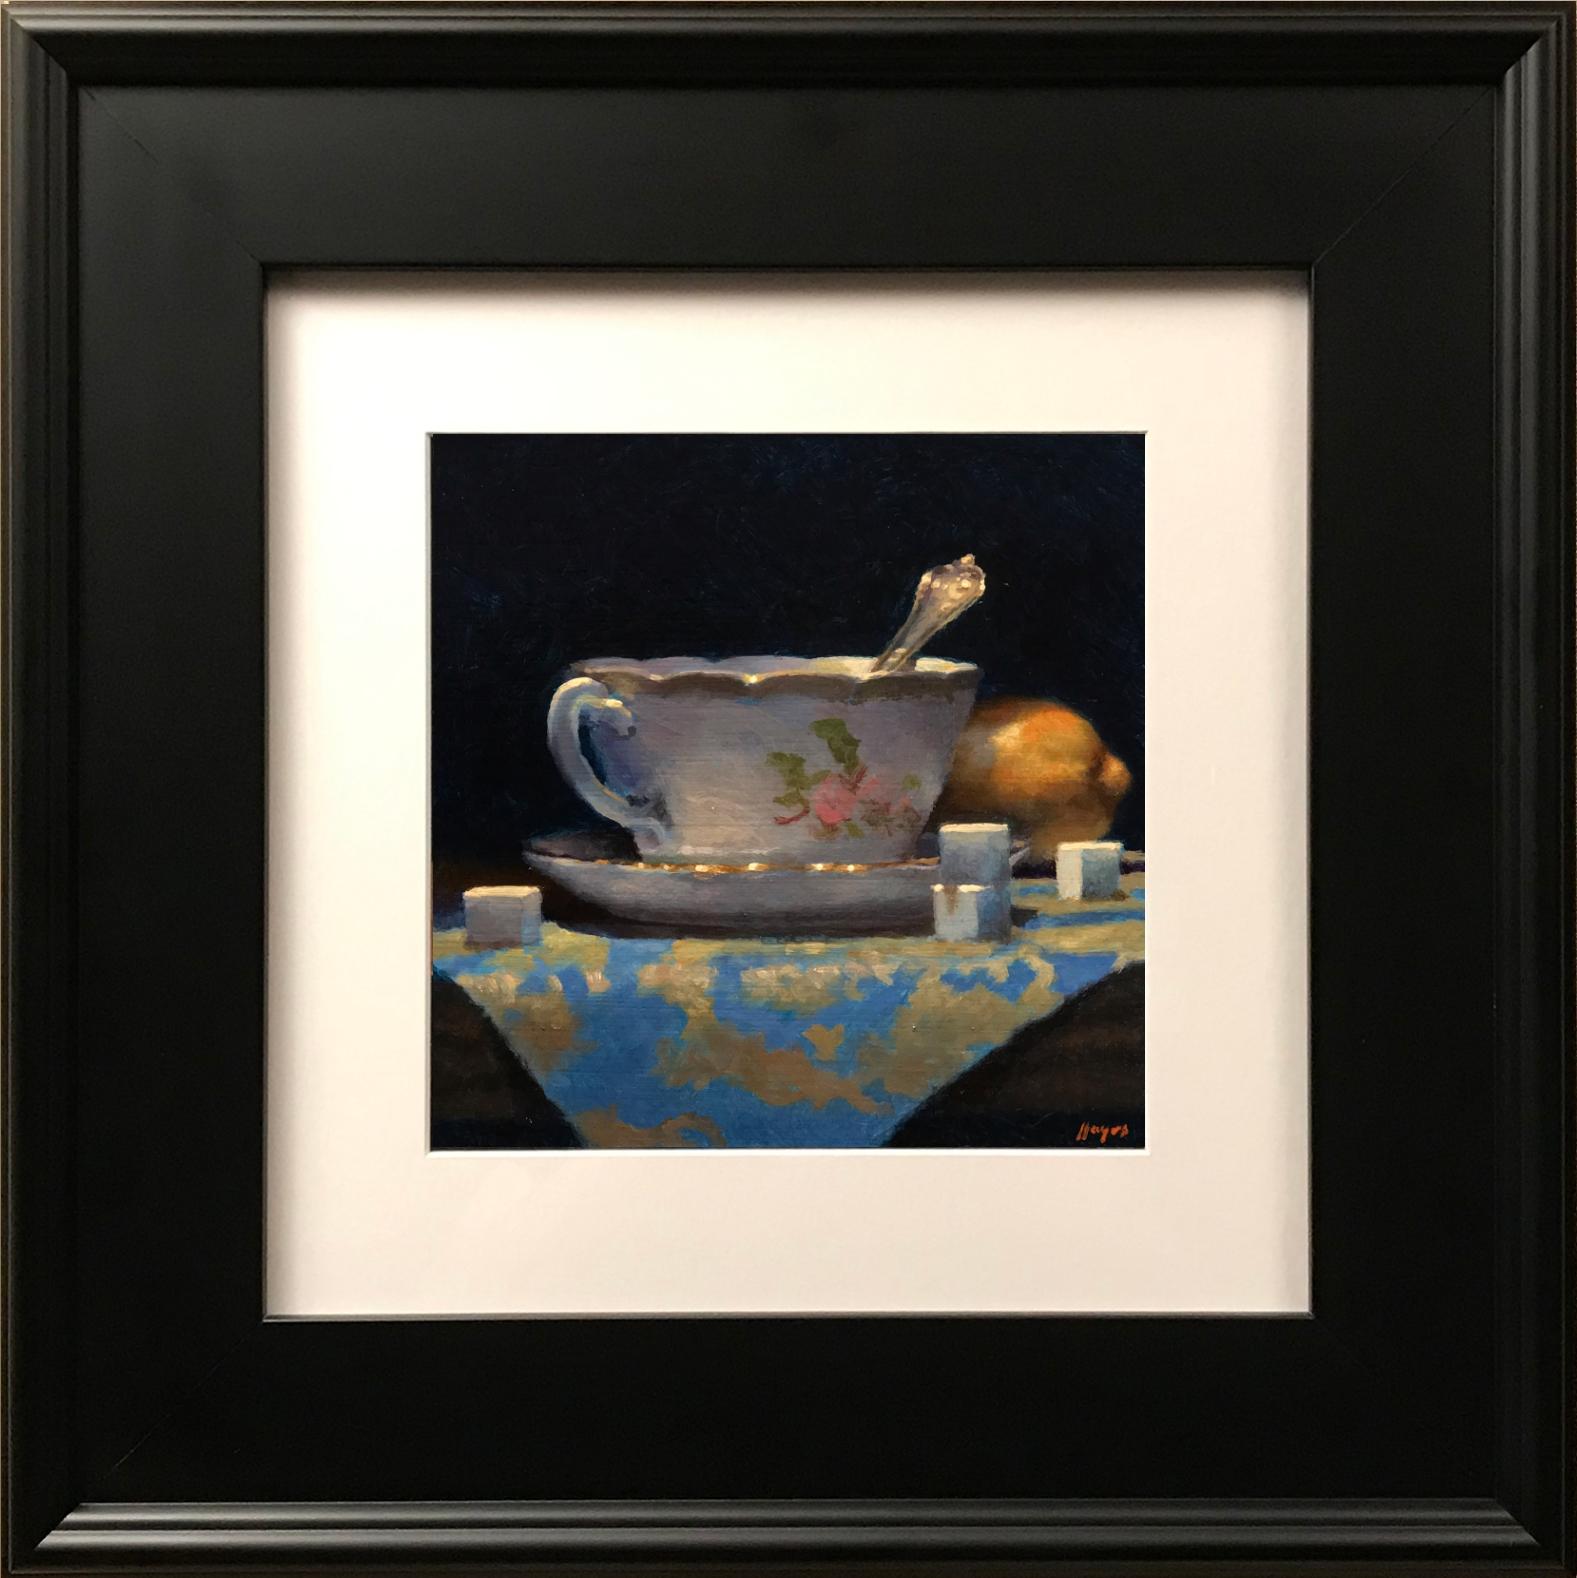 101465-square-print-plein-air-framed-black-cropped